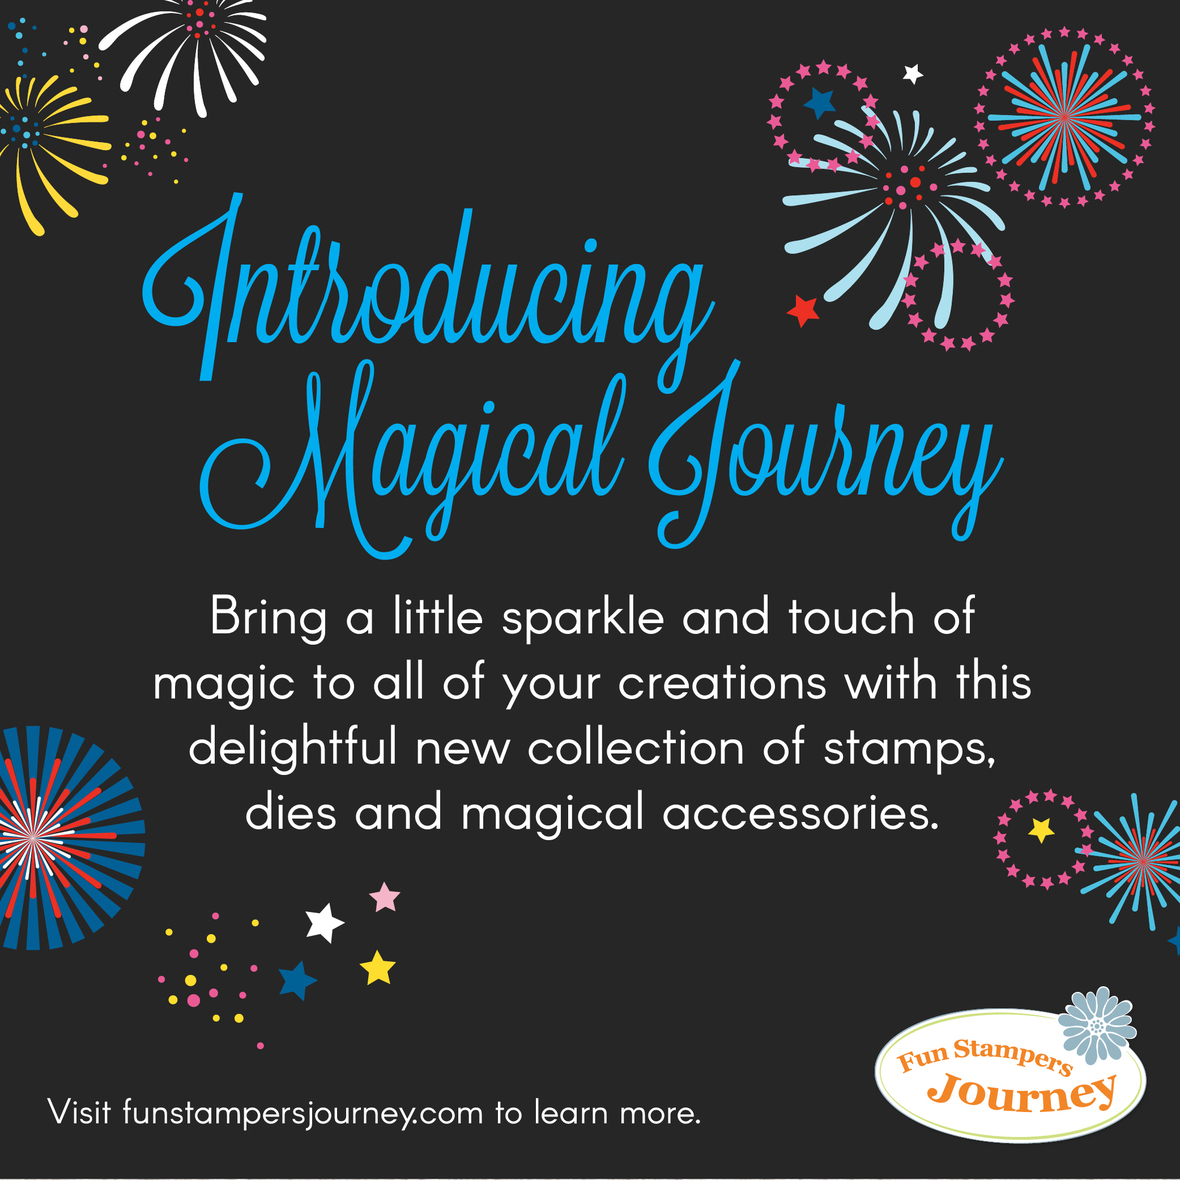 Magical Journey social media